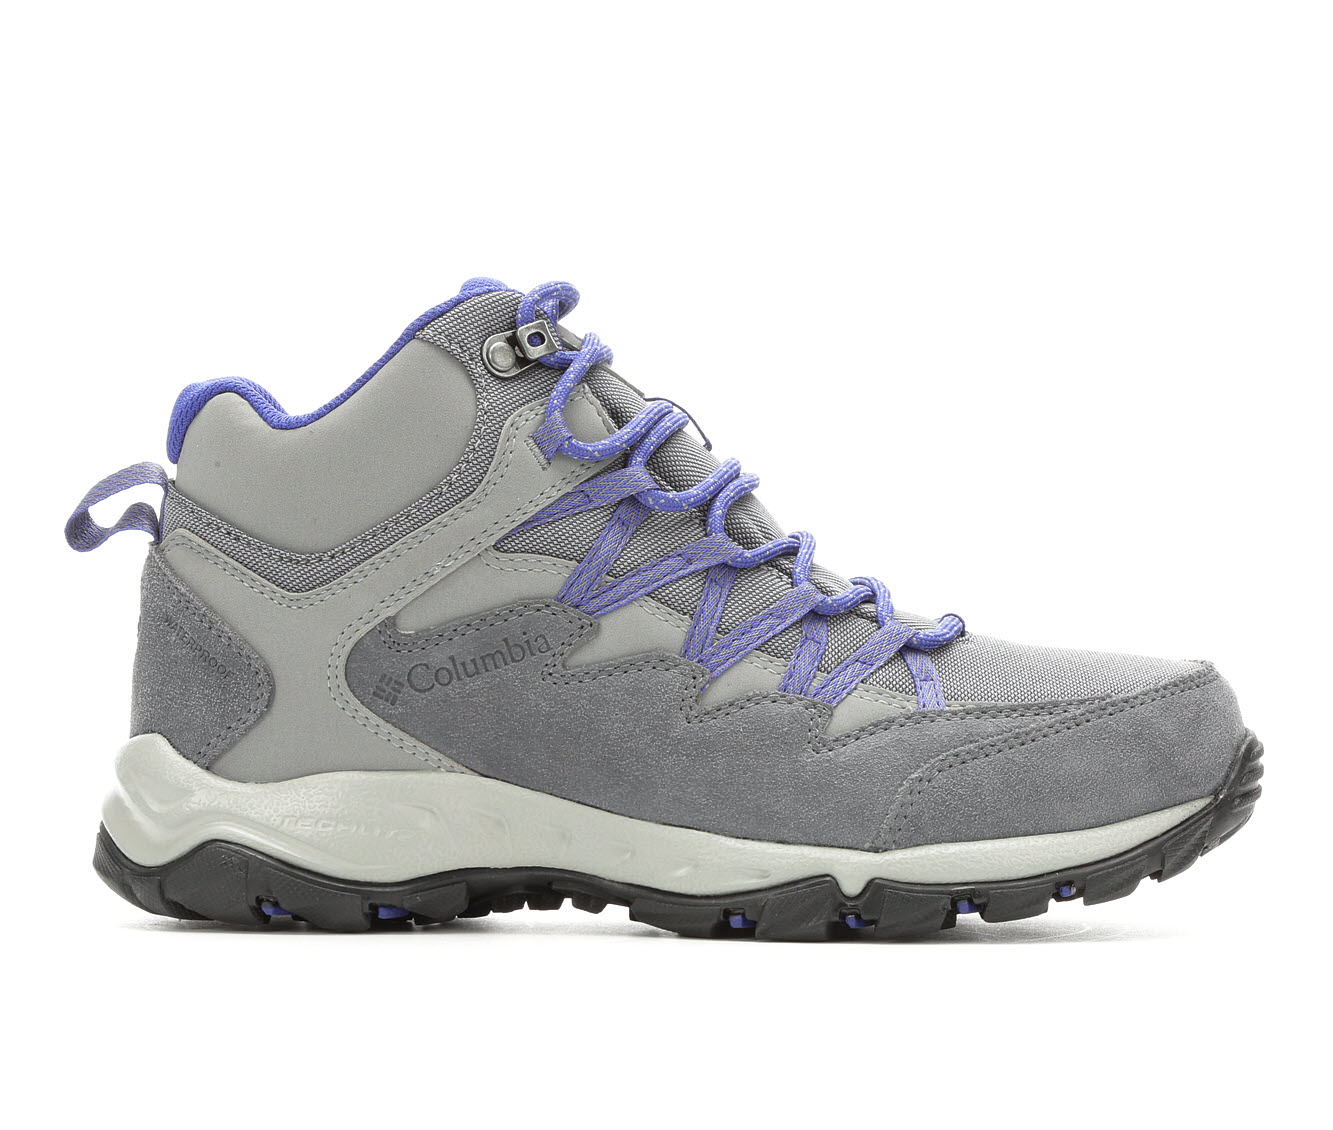 Columbia Wahkeena MID WP Women's Shoe (Blue - Suede)